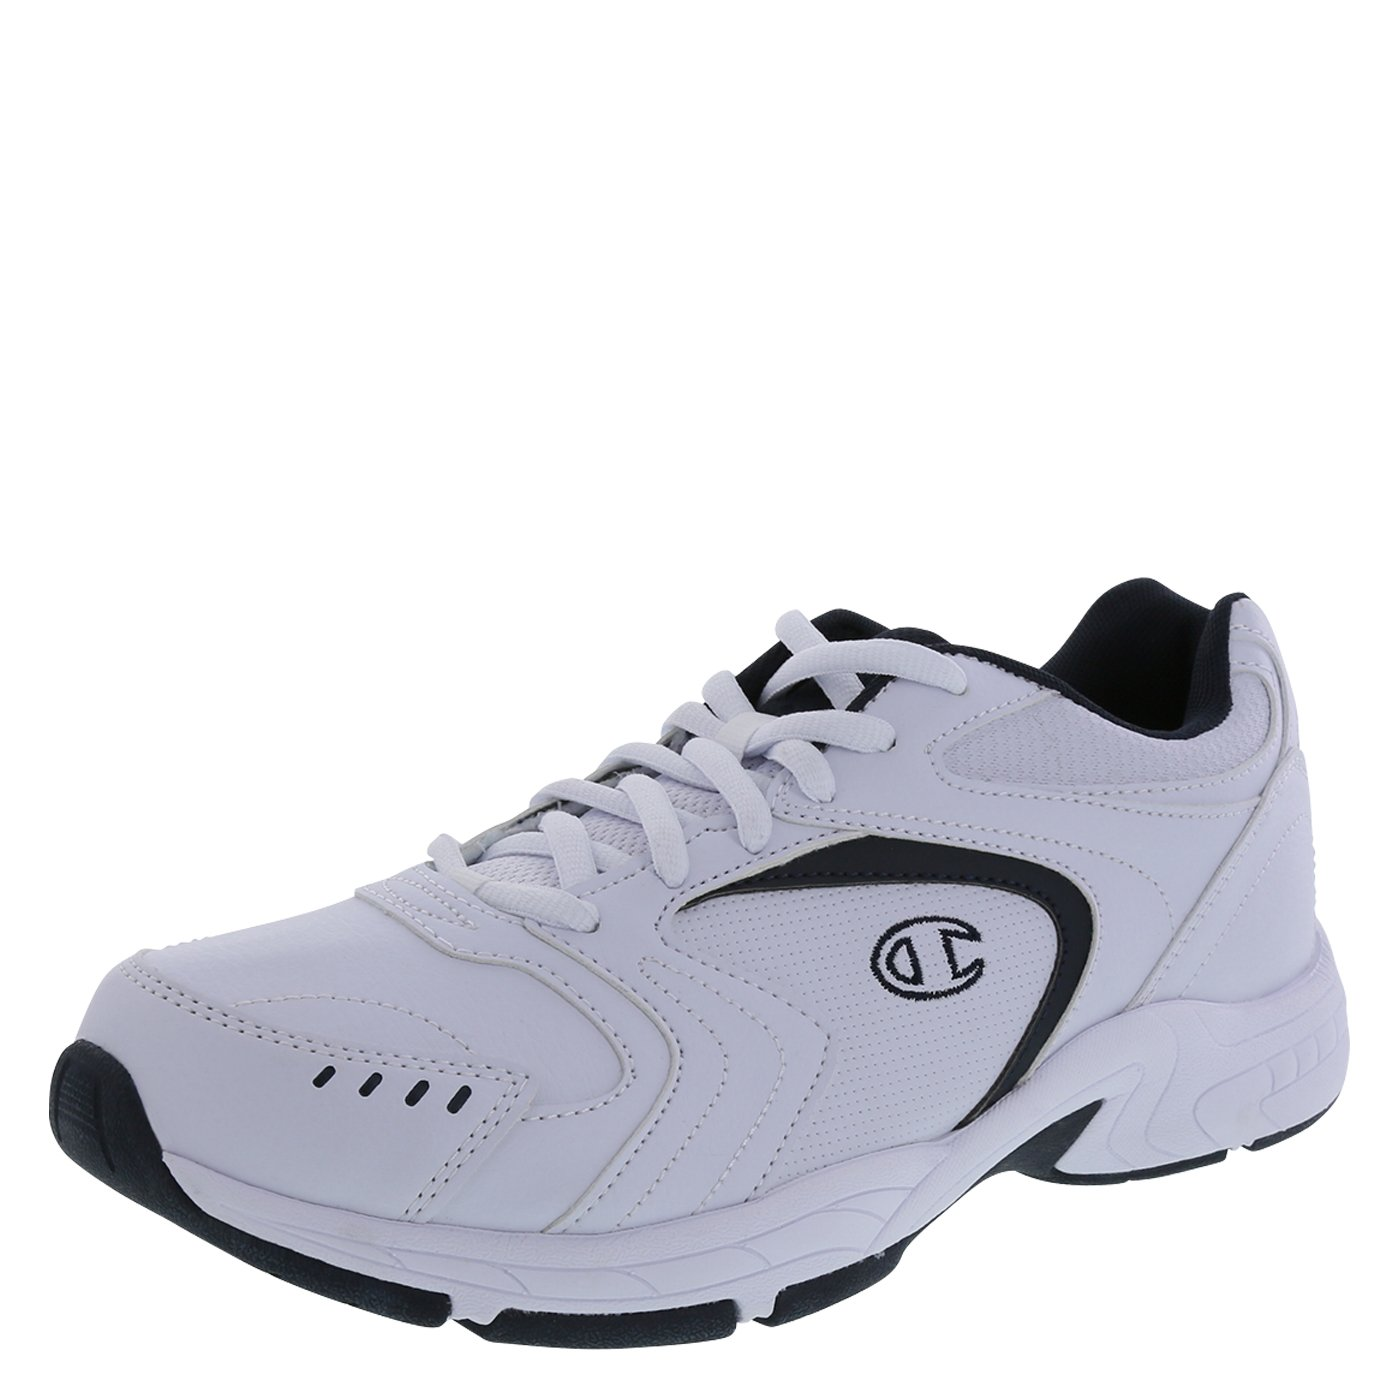 6261bcfe2c8047 Champion mens prime cross trainer fitness cross training jpg 1400x1400  Champion tennis shoes for men